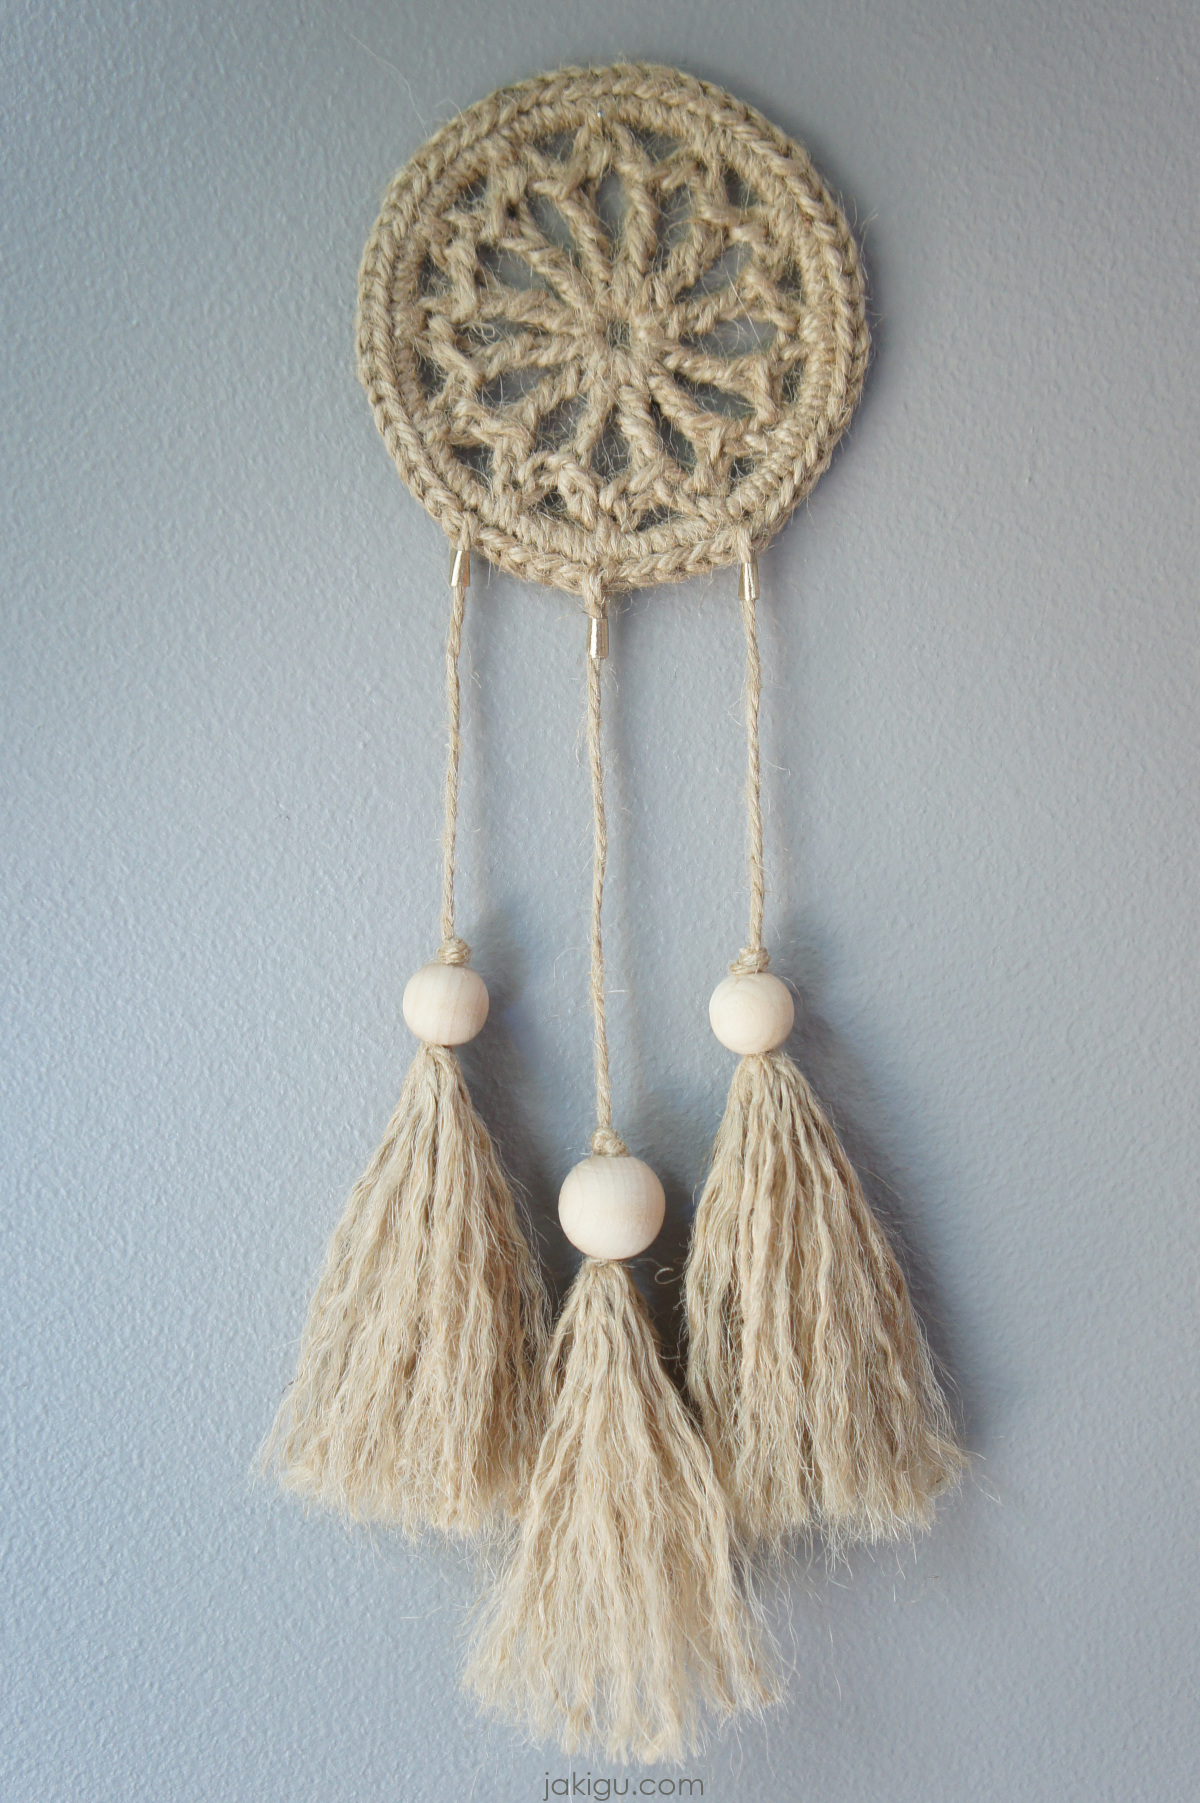 jakigu.com | crochet jute wall hanging - dreamcatcher - macrachet